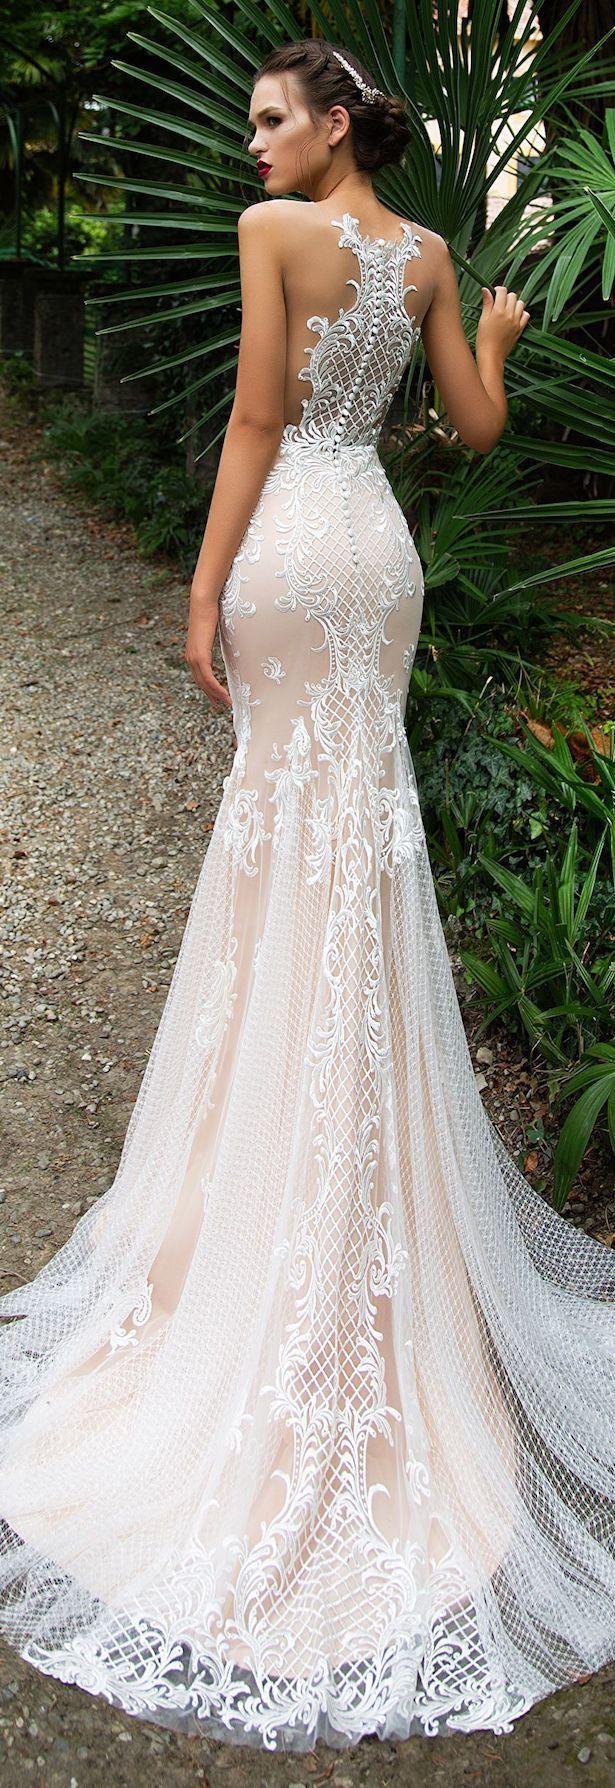 Wedding Dress By Milla Nova White Desire 2017 Bridal Collection Lace Bodycon A Line Elegant Luxury